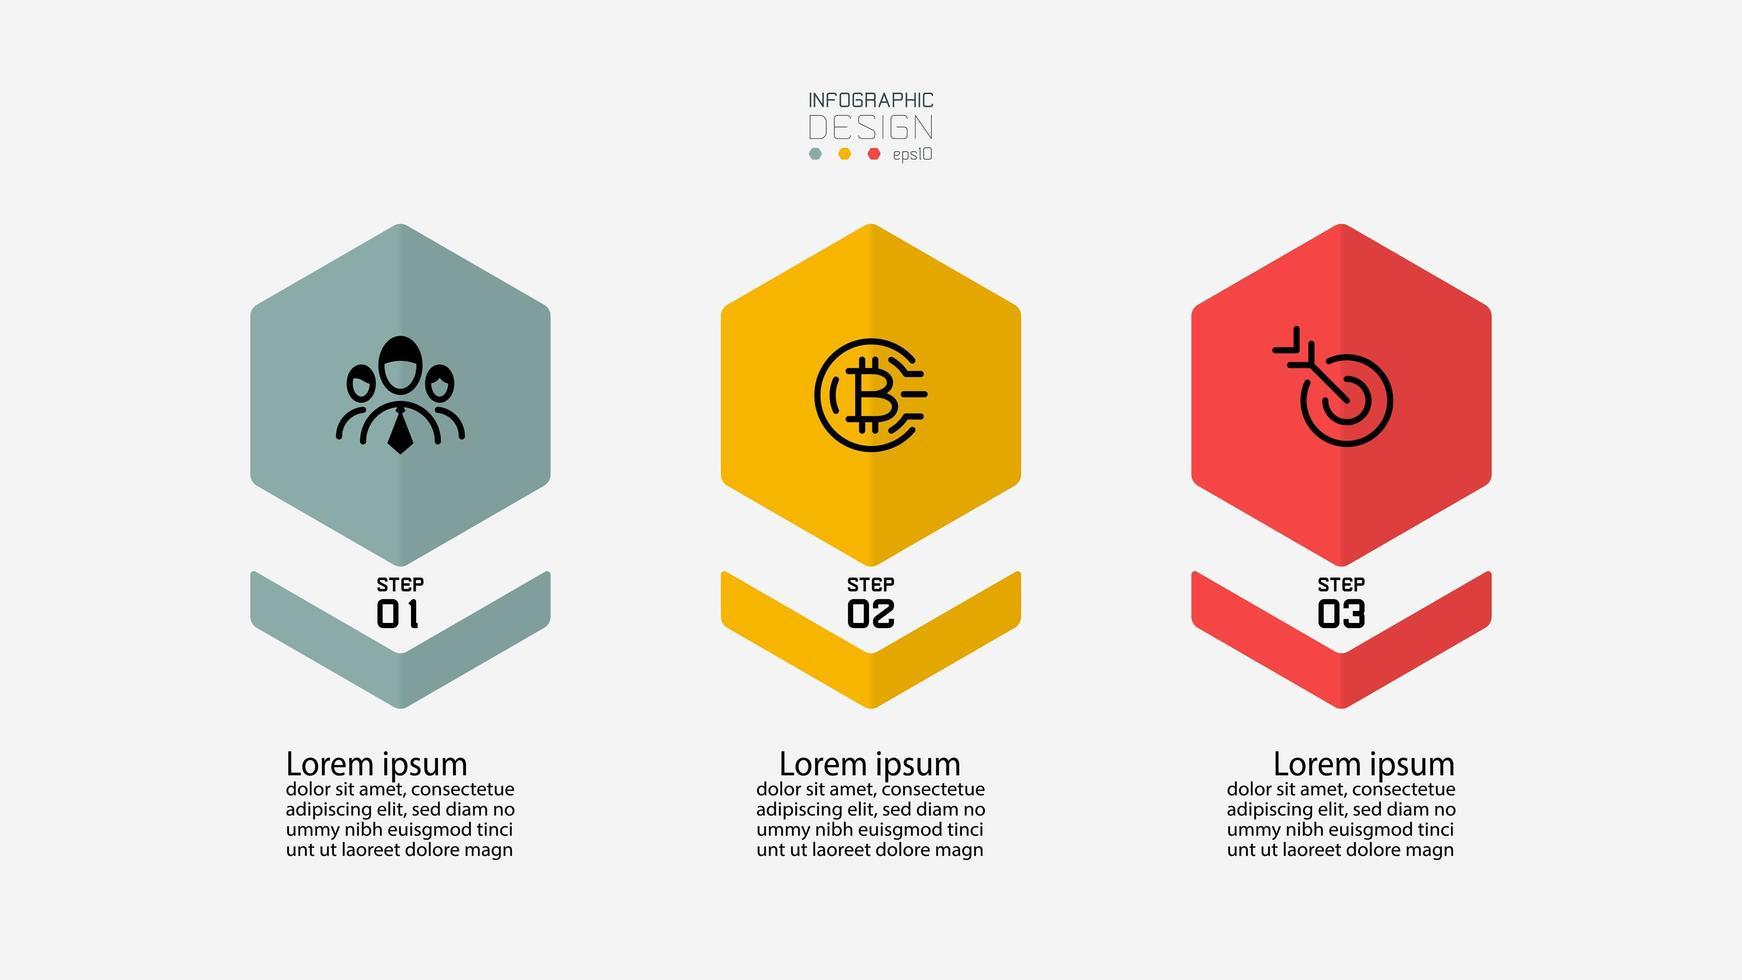 conjunto de ícones de infográfico de forma hexagonal vetor